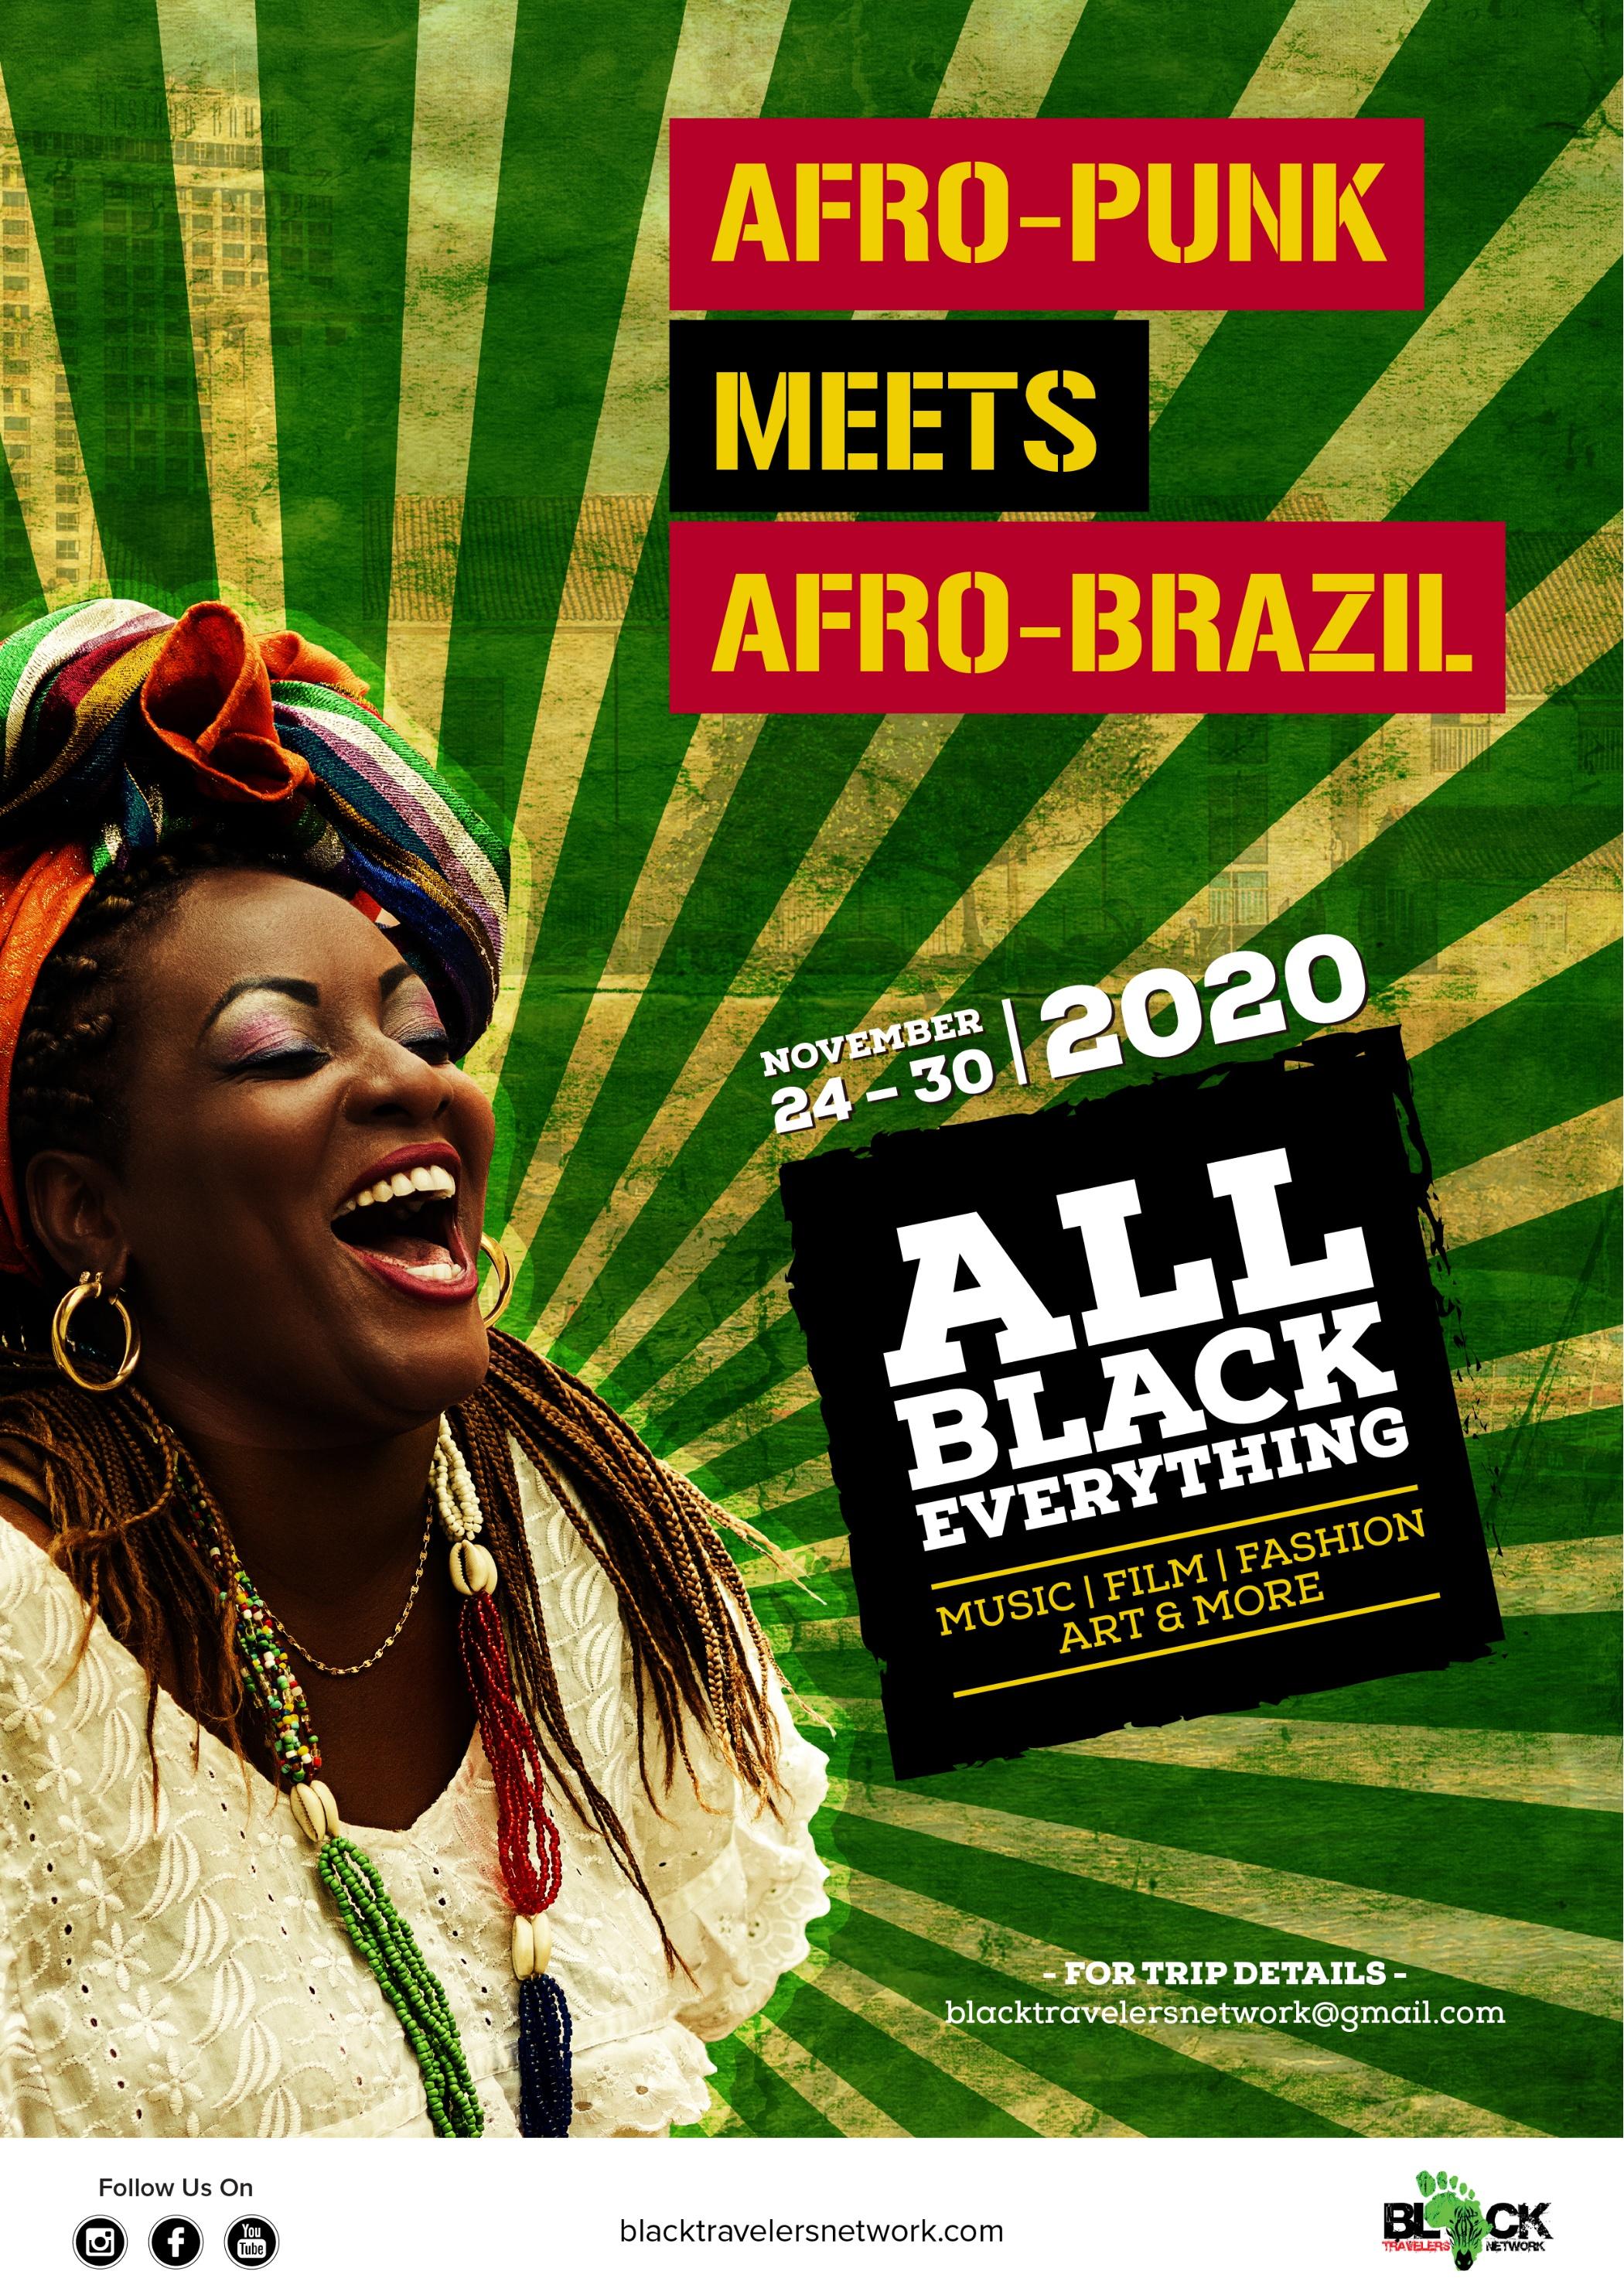 Afro-Punk Meets Afro-Brazil